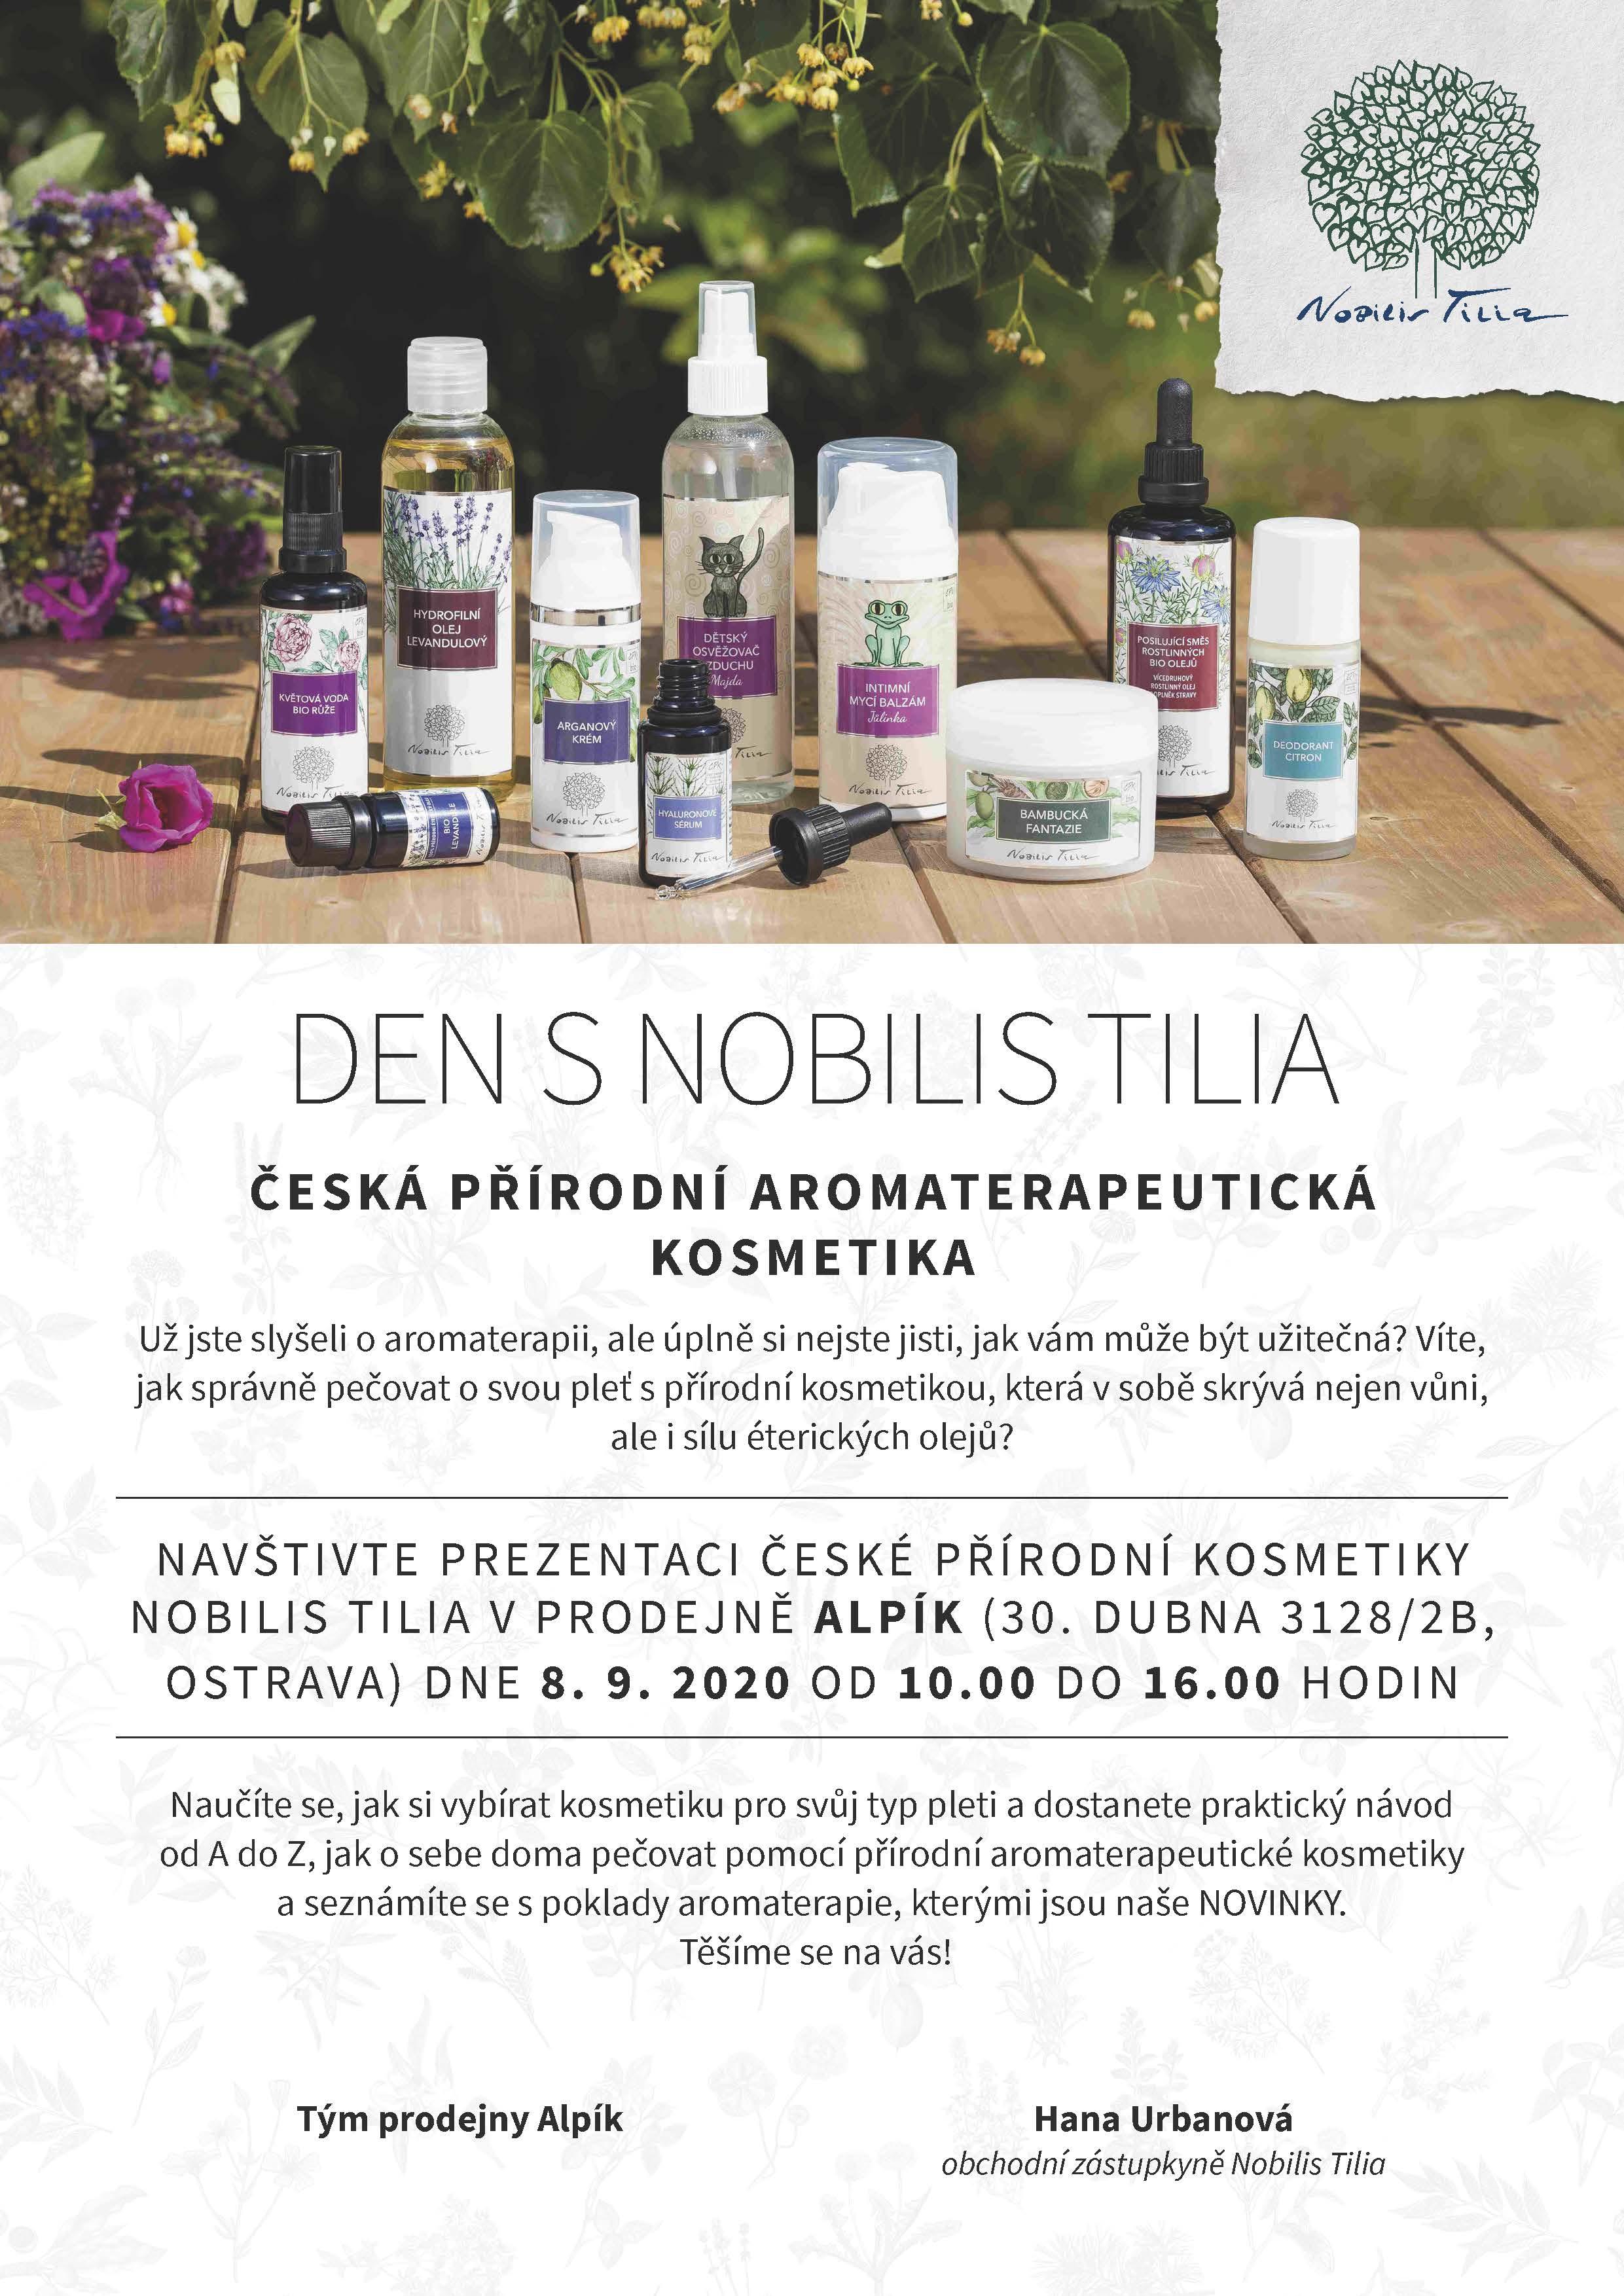 Pozvánka na den s Nobilis Tilia v Alpíku - 8.9.